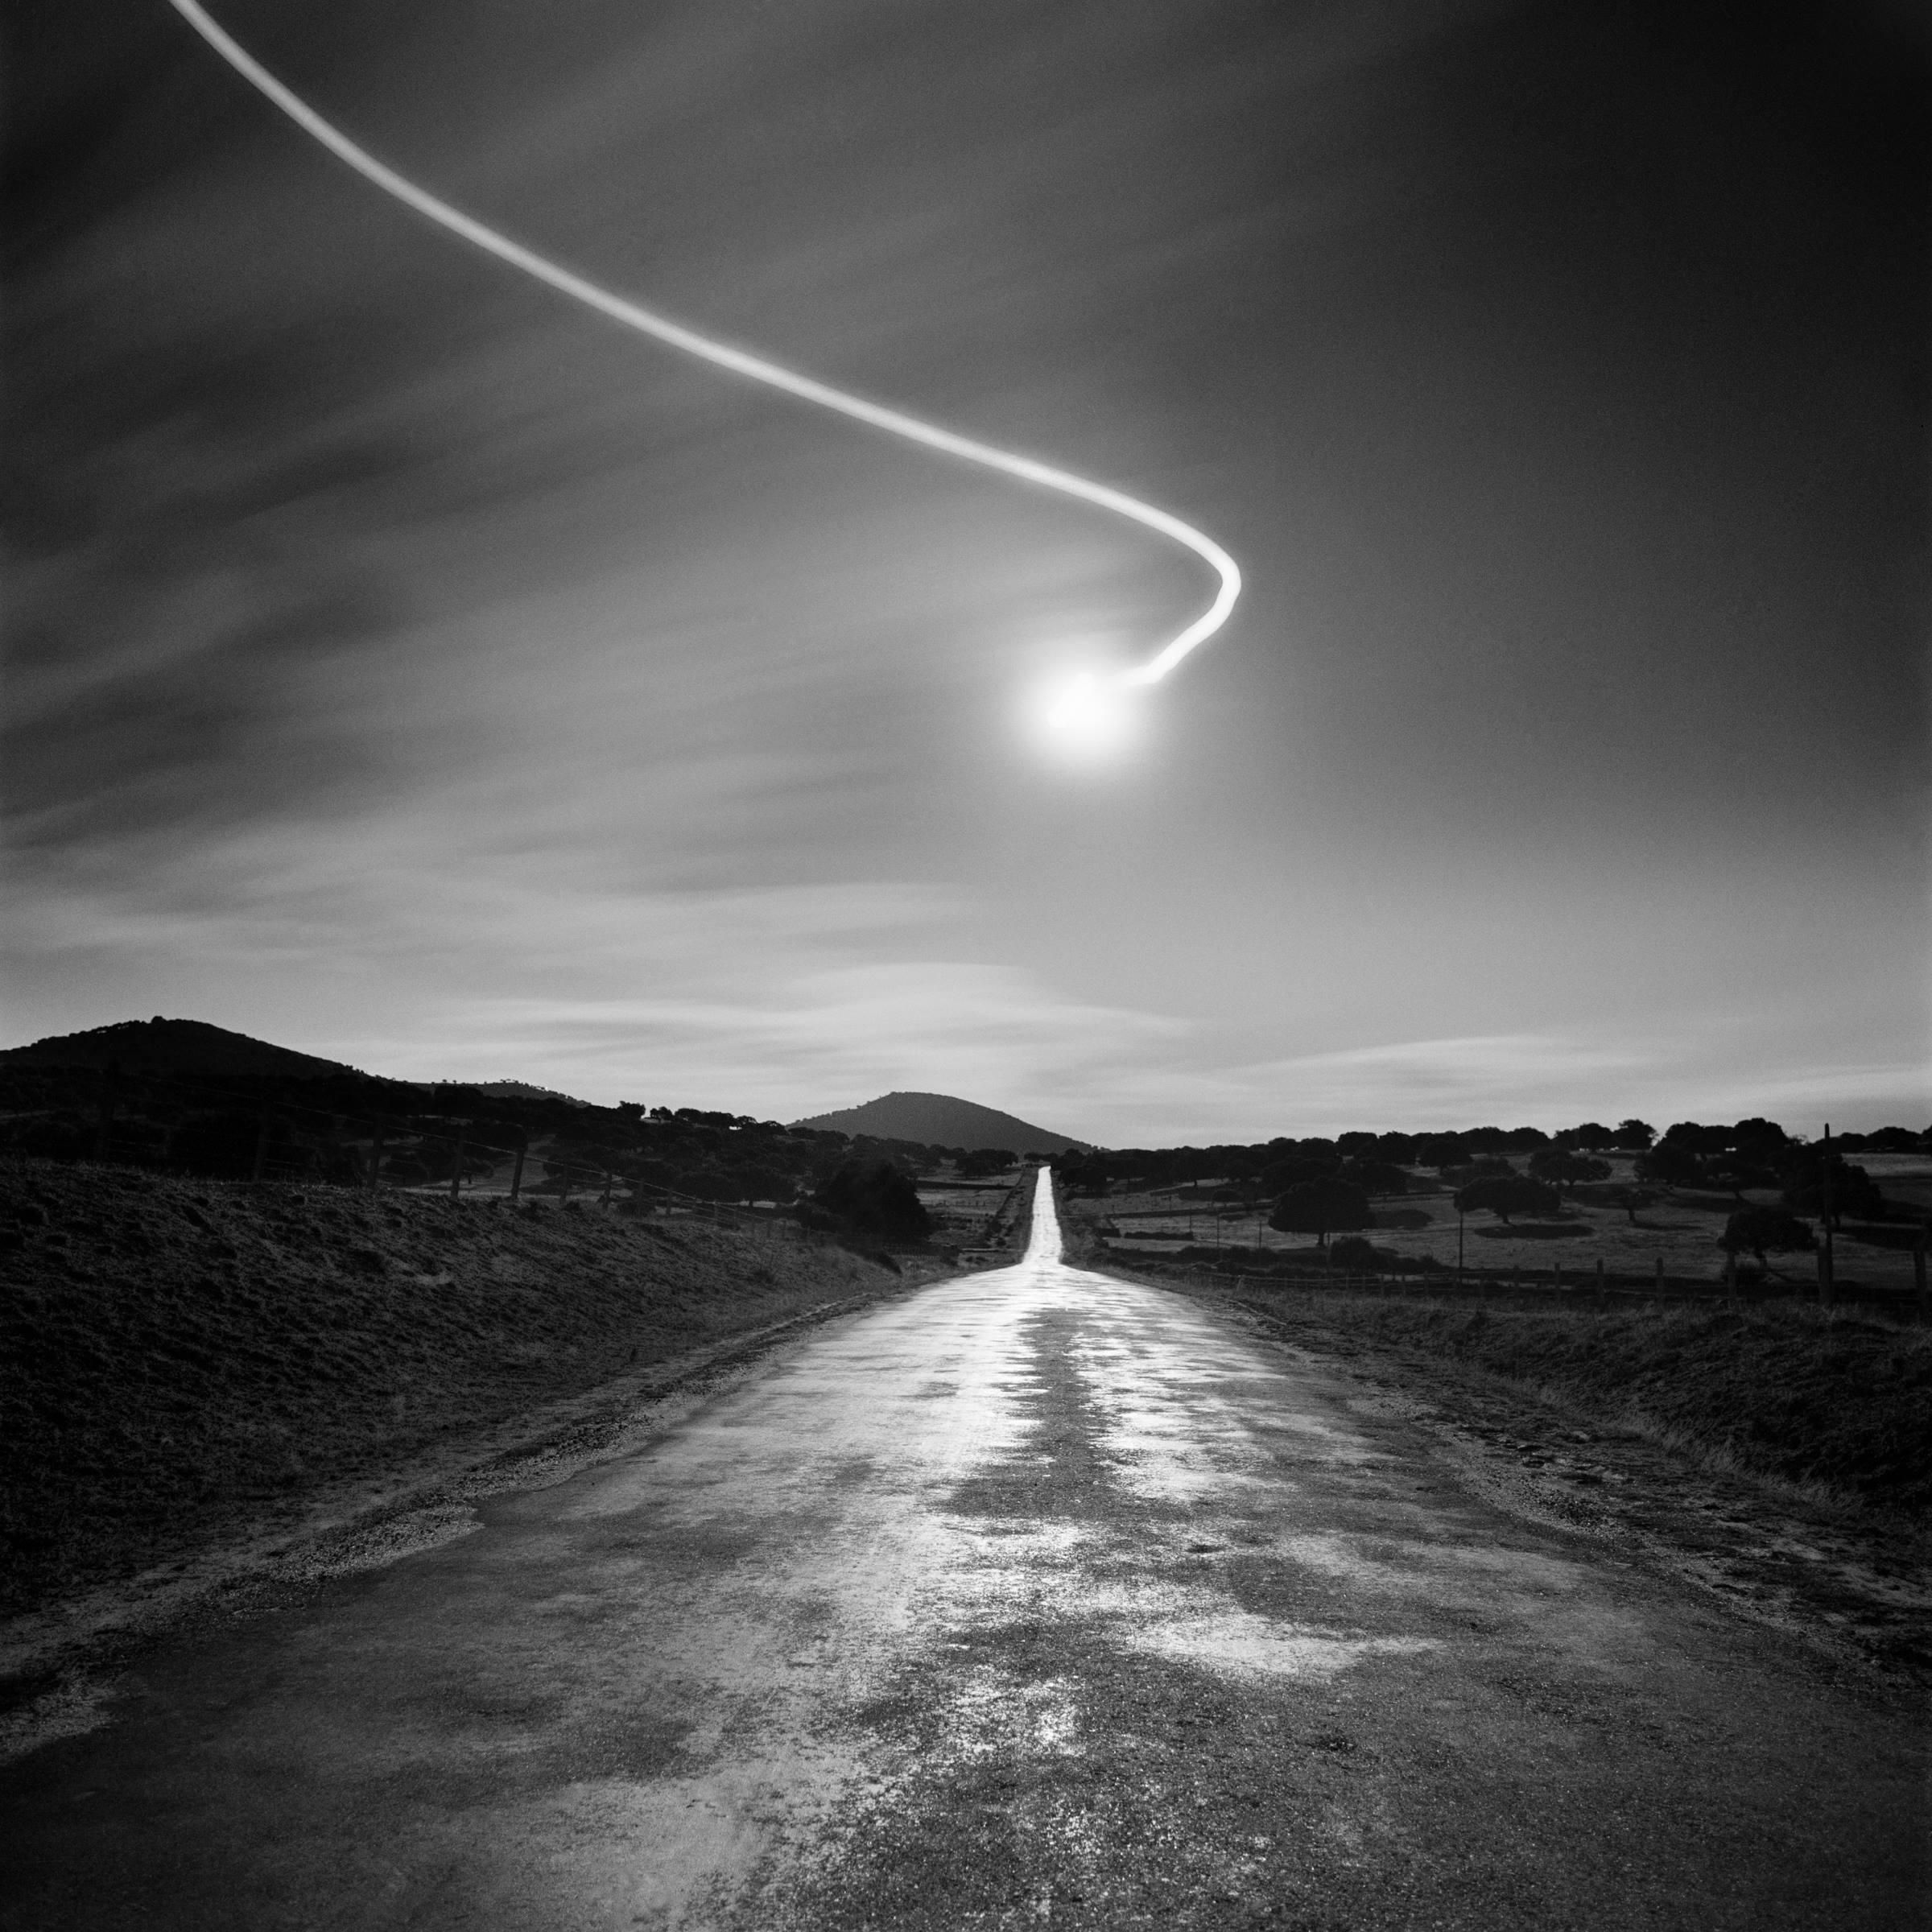 Carretera de Cespedosa, 1987<br/>Virado al sulfuro / Sulfide Toner